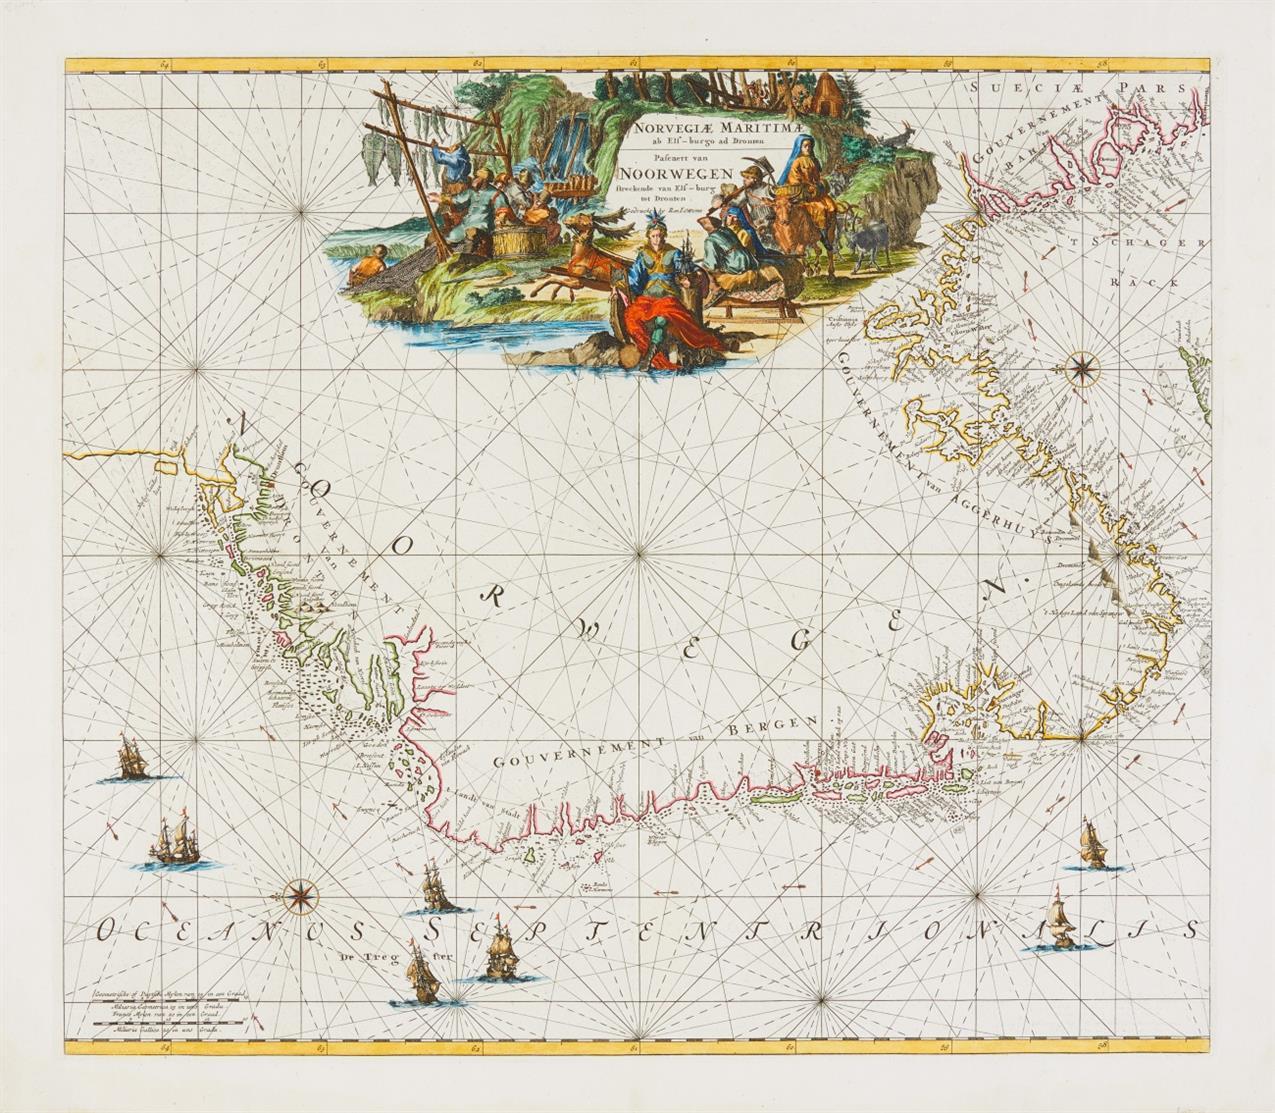 Norwegen. Norvegiae Maritima ... Um 1670. Kolor. Kupferstichkarte bei F. de Wit. Seekarte.